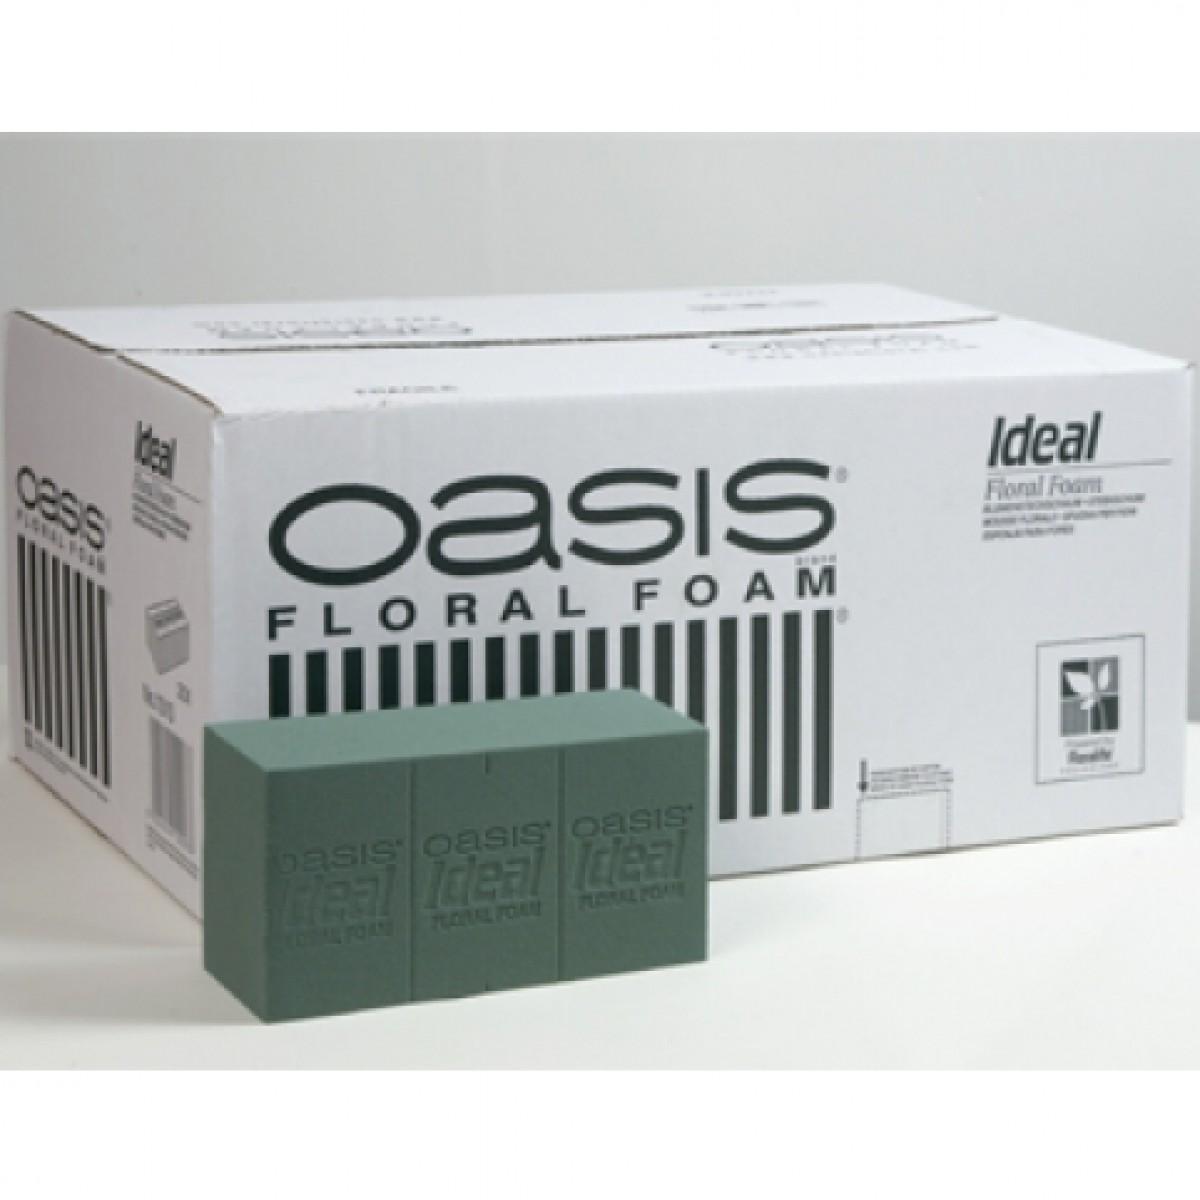 Ideal Brick (20 Nos) Oasis Floral Foam